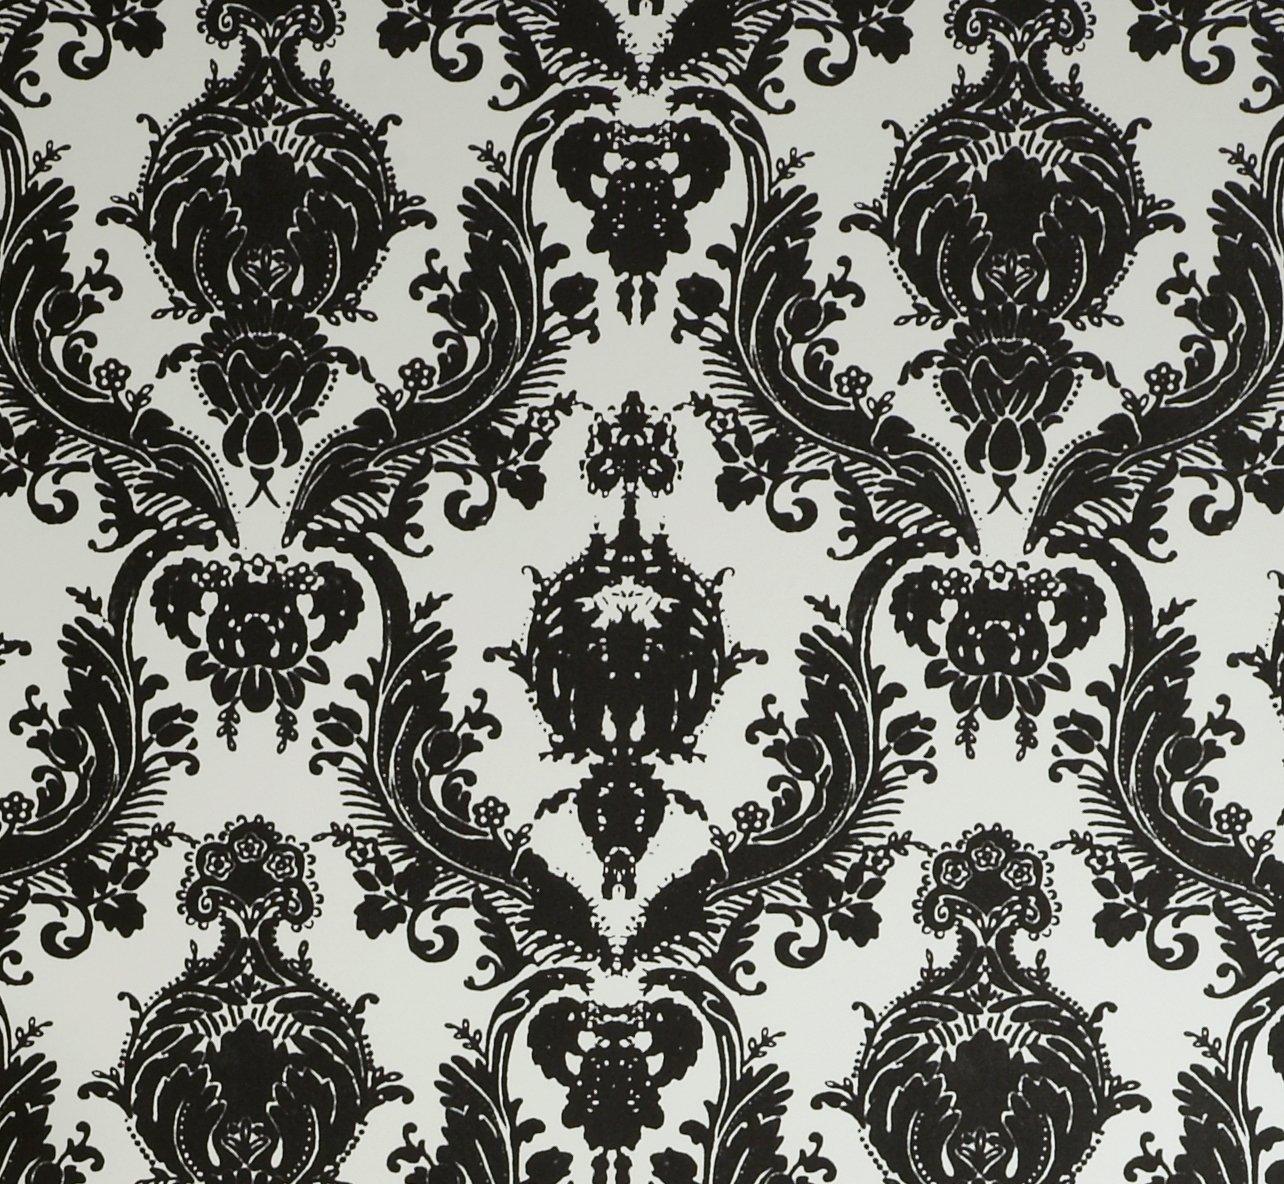 vintage wallpaper 1 tempaper designs da 005 damsel self adhesive temporary wallpaper white and. Black Bedroom Furniture Sets. Home Design Ideas